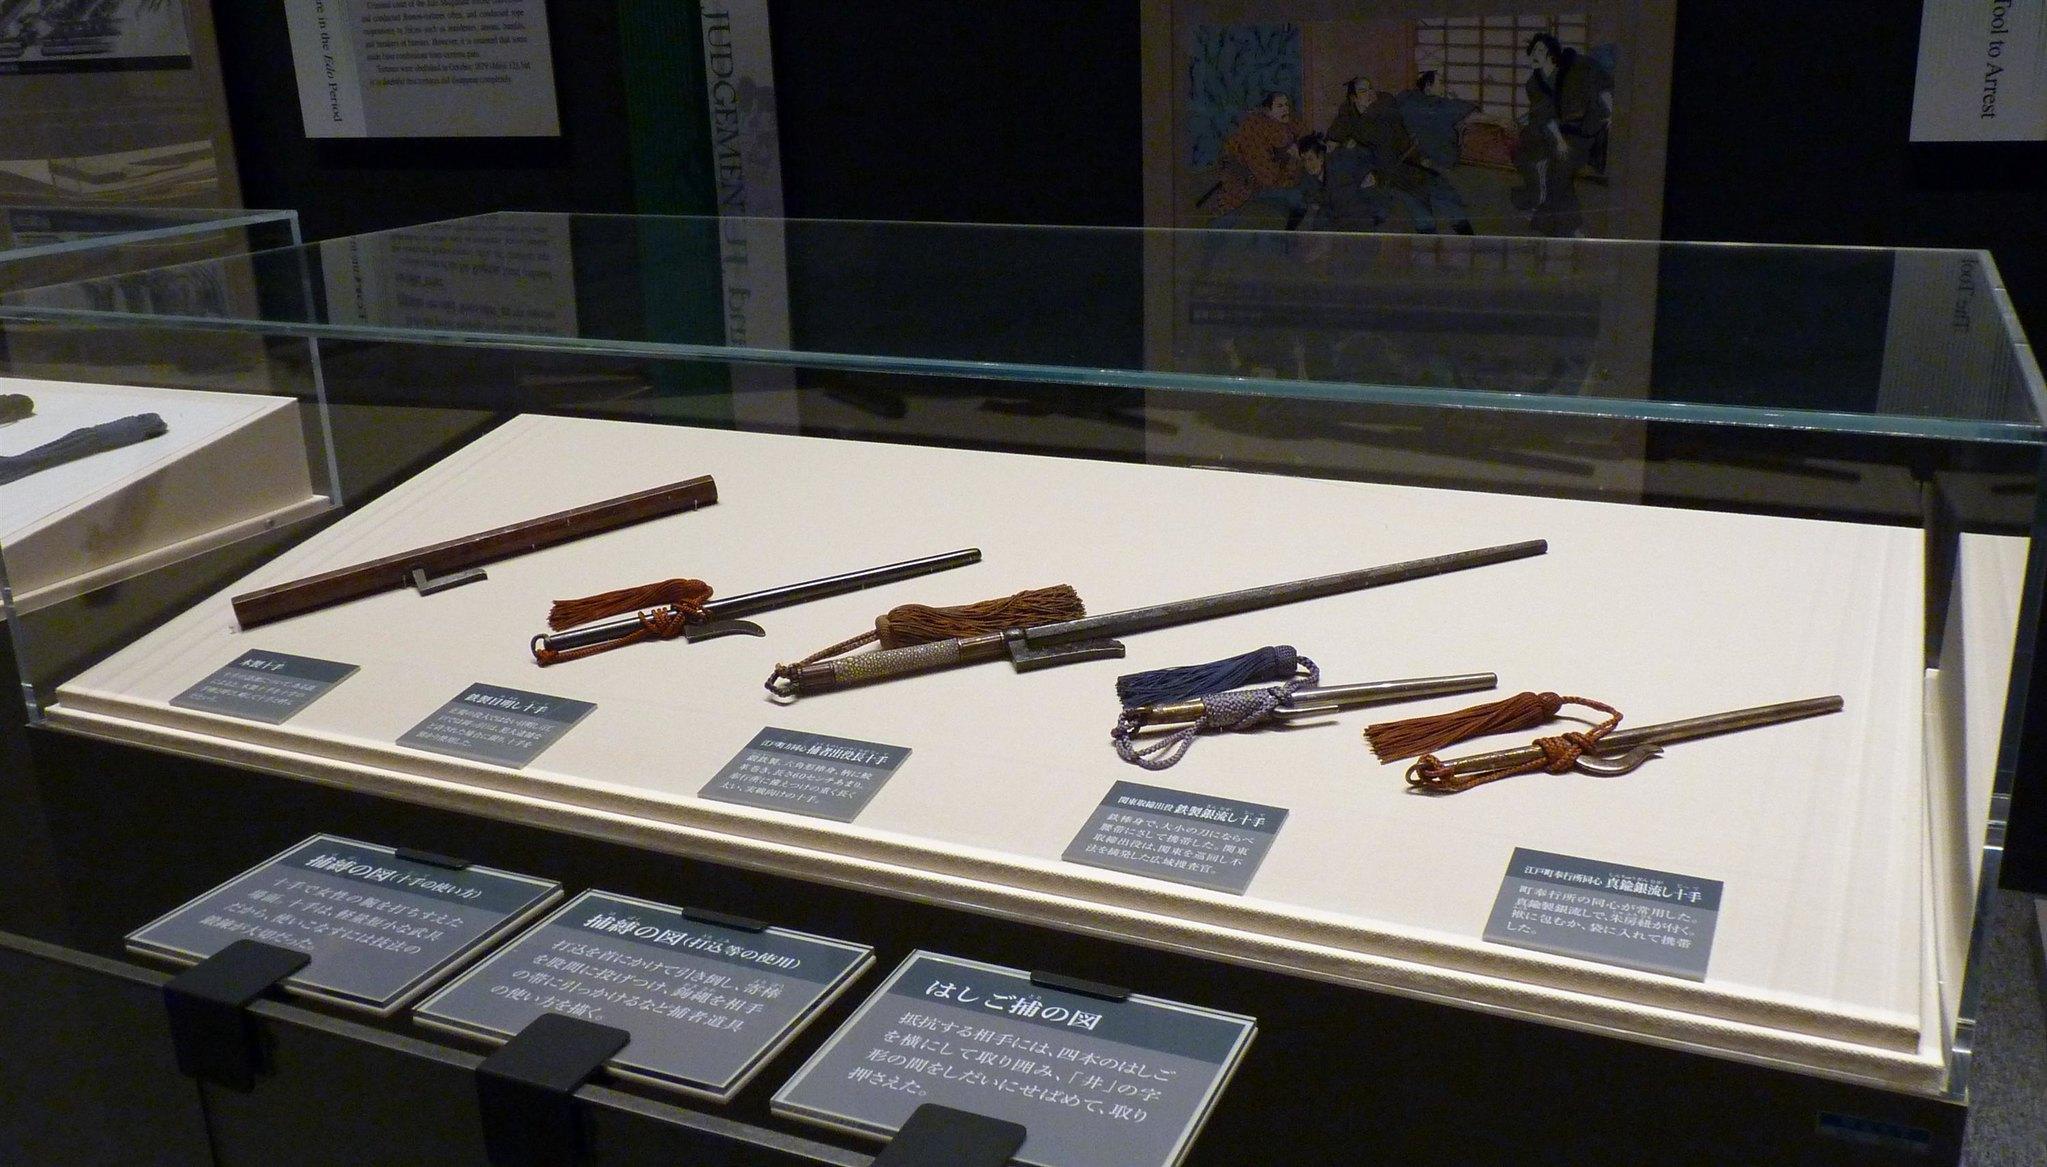 Criminal Materials Department at Meiji University